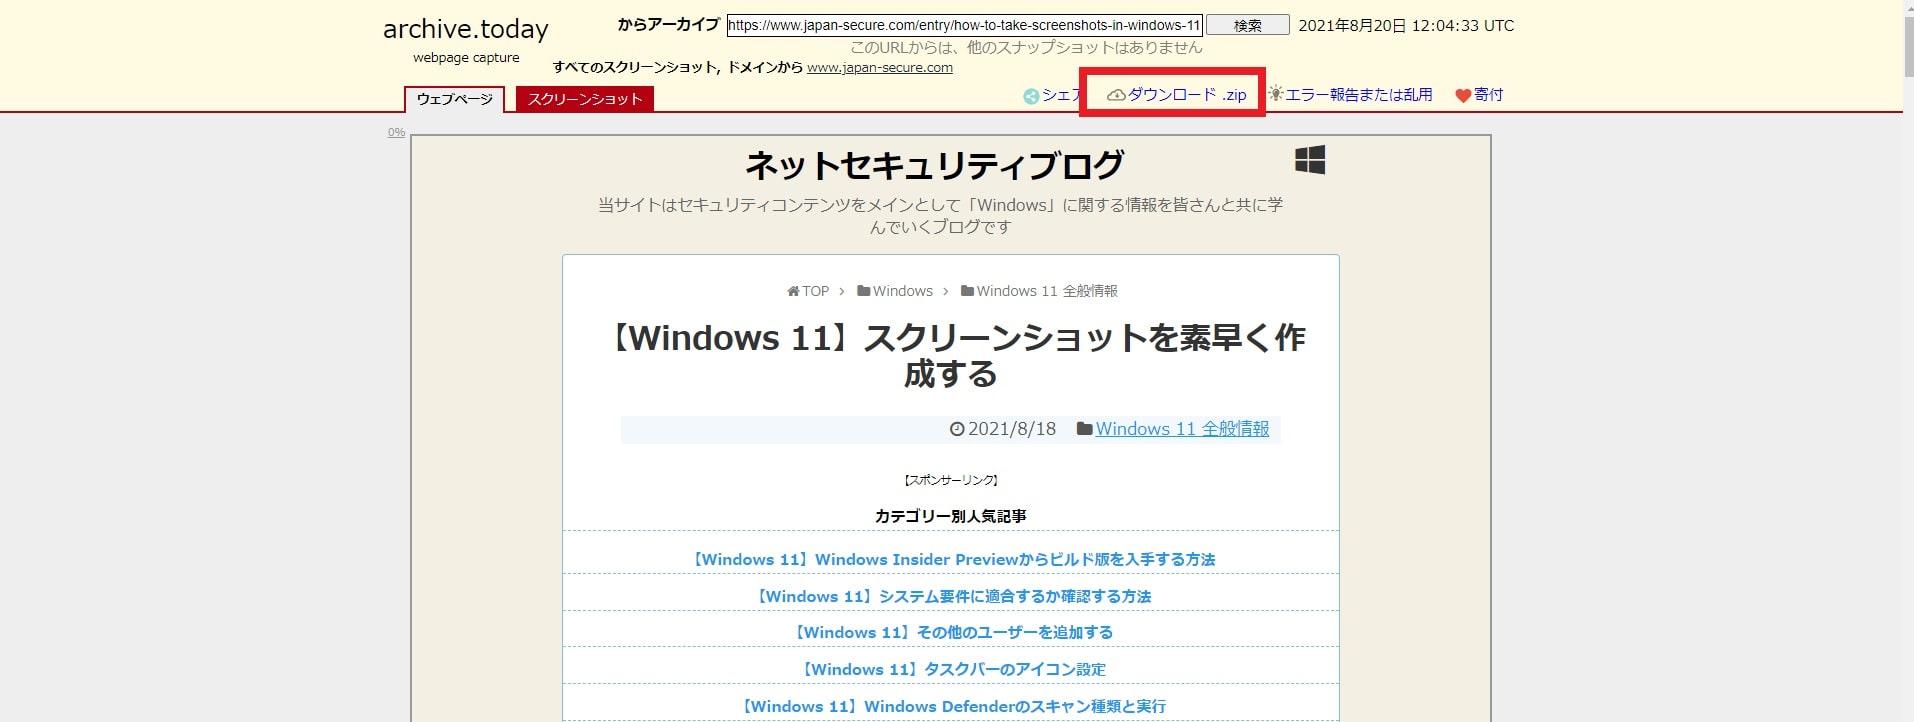 Archive.nuでネットセキュリティブログの個別記事を保存した画面